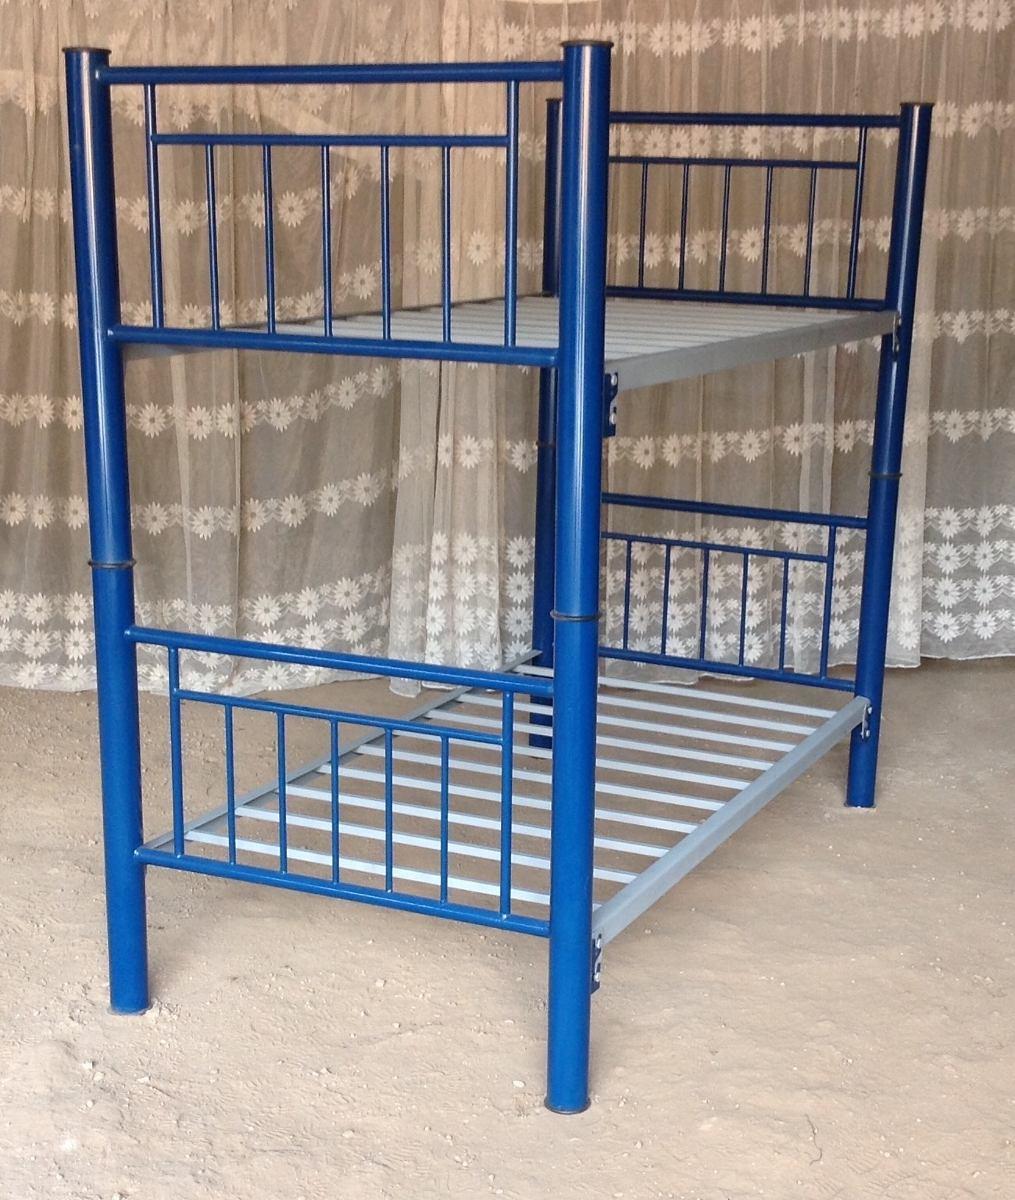 Muebles Tubulares Nazaret 1 900 00 En Mercado Libre # Muebles Tubulares